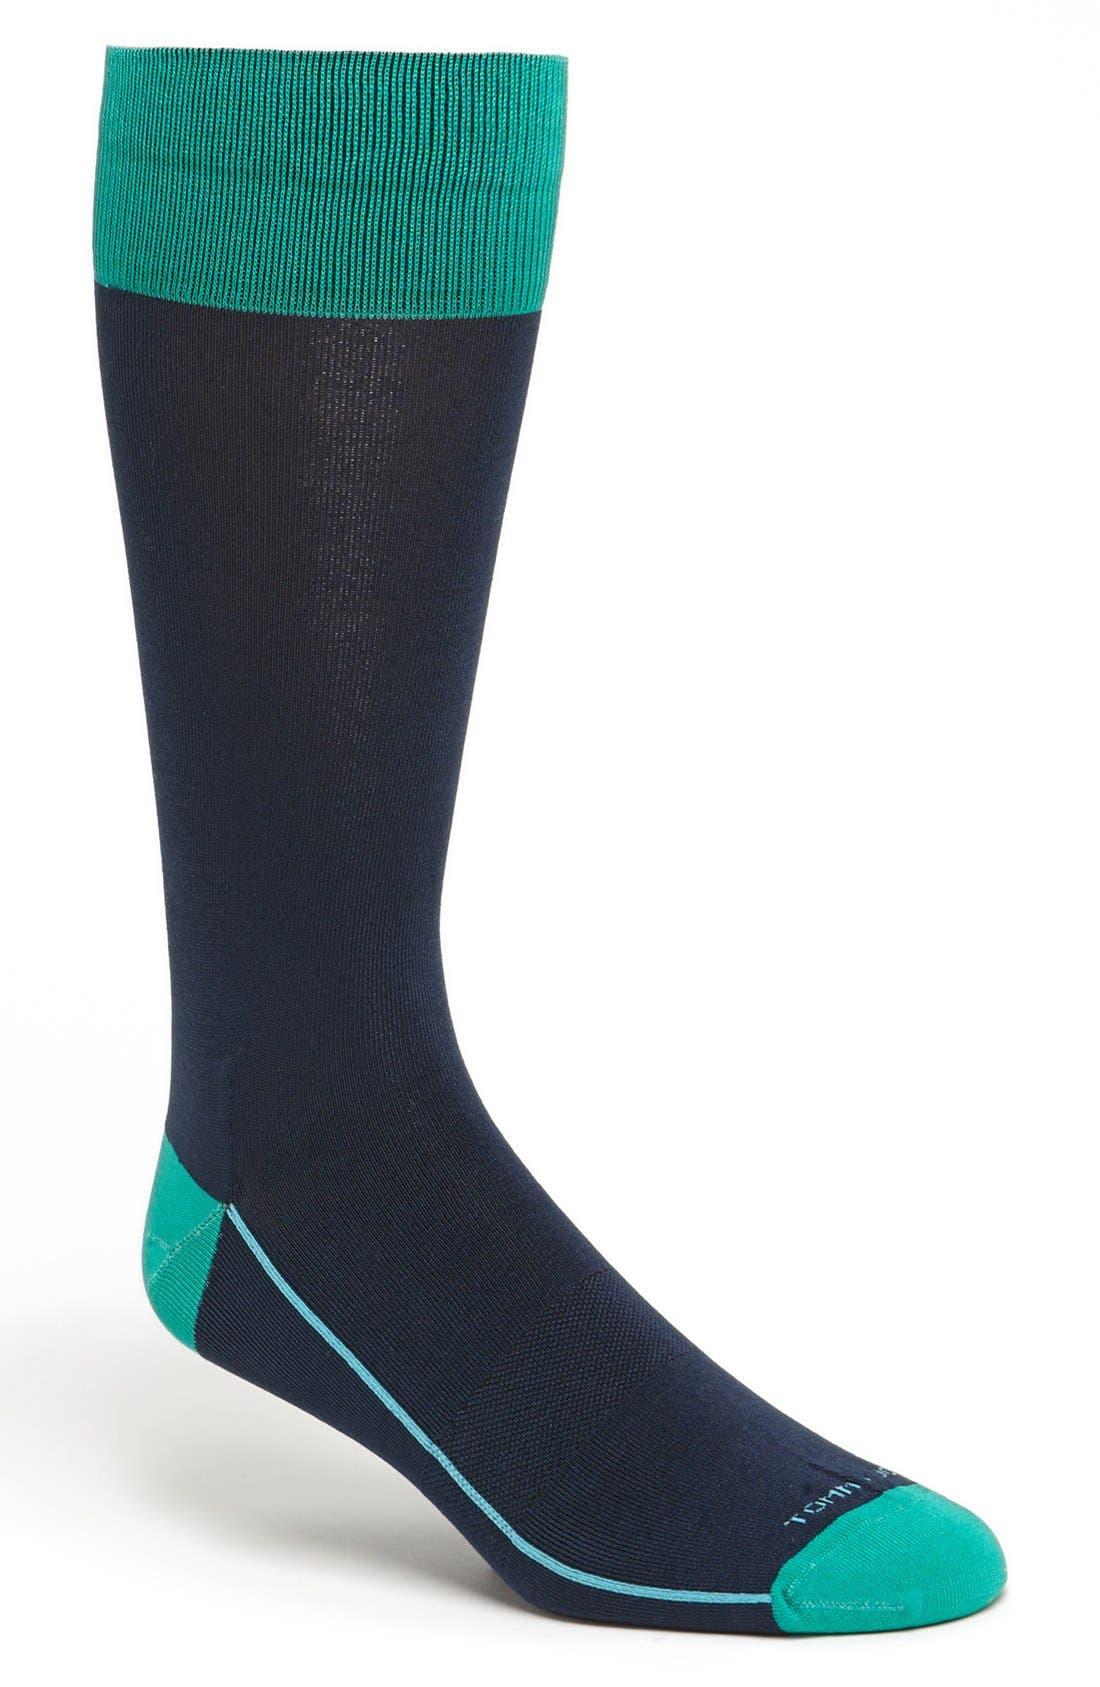 Main Image - Tommy John Solid Cotton Blend Socks